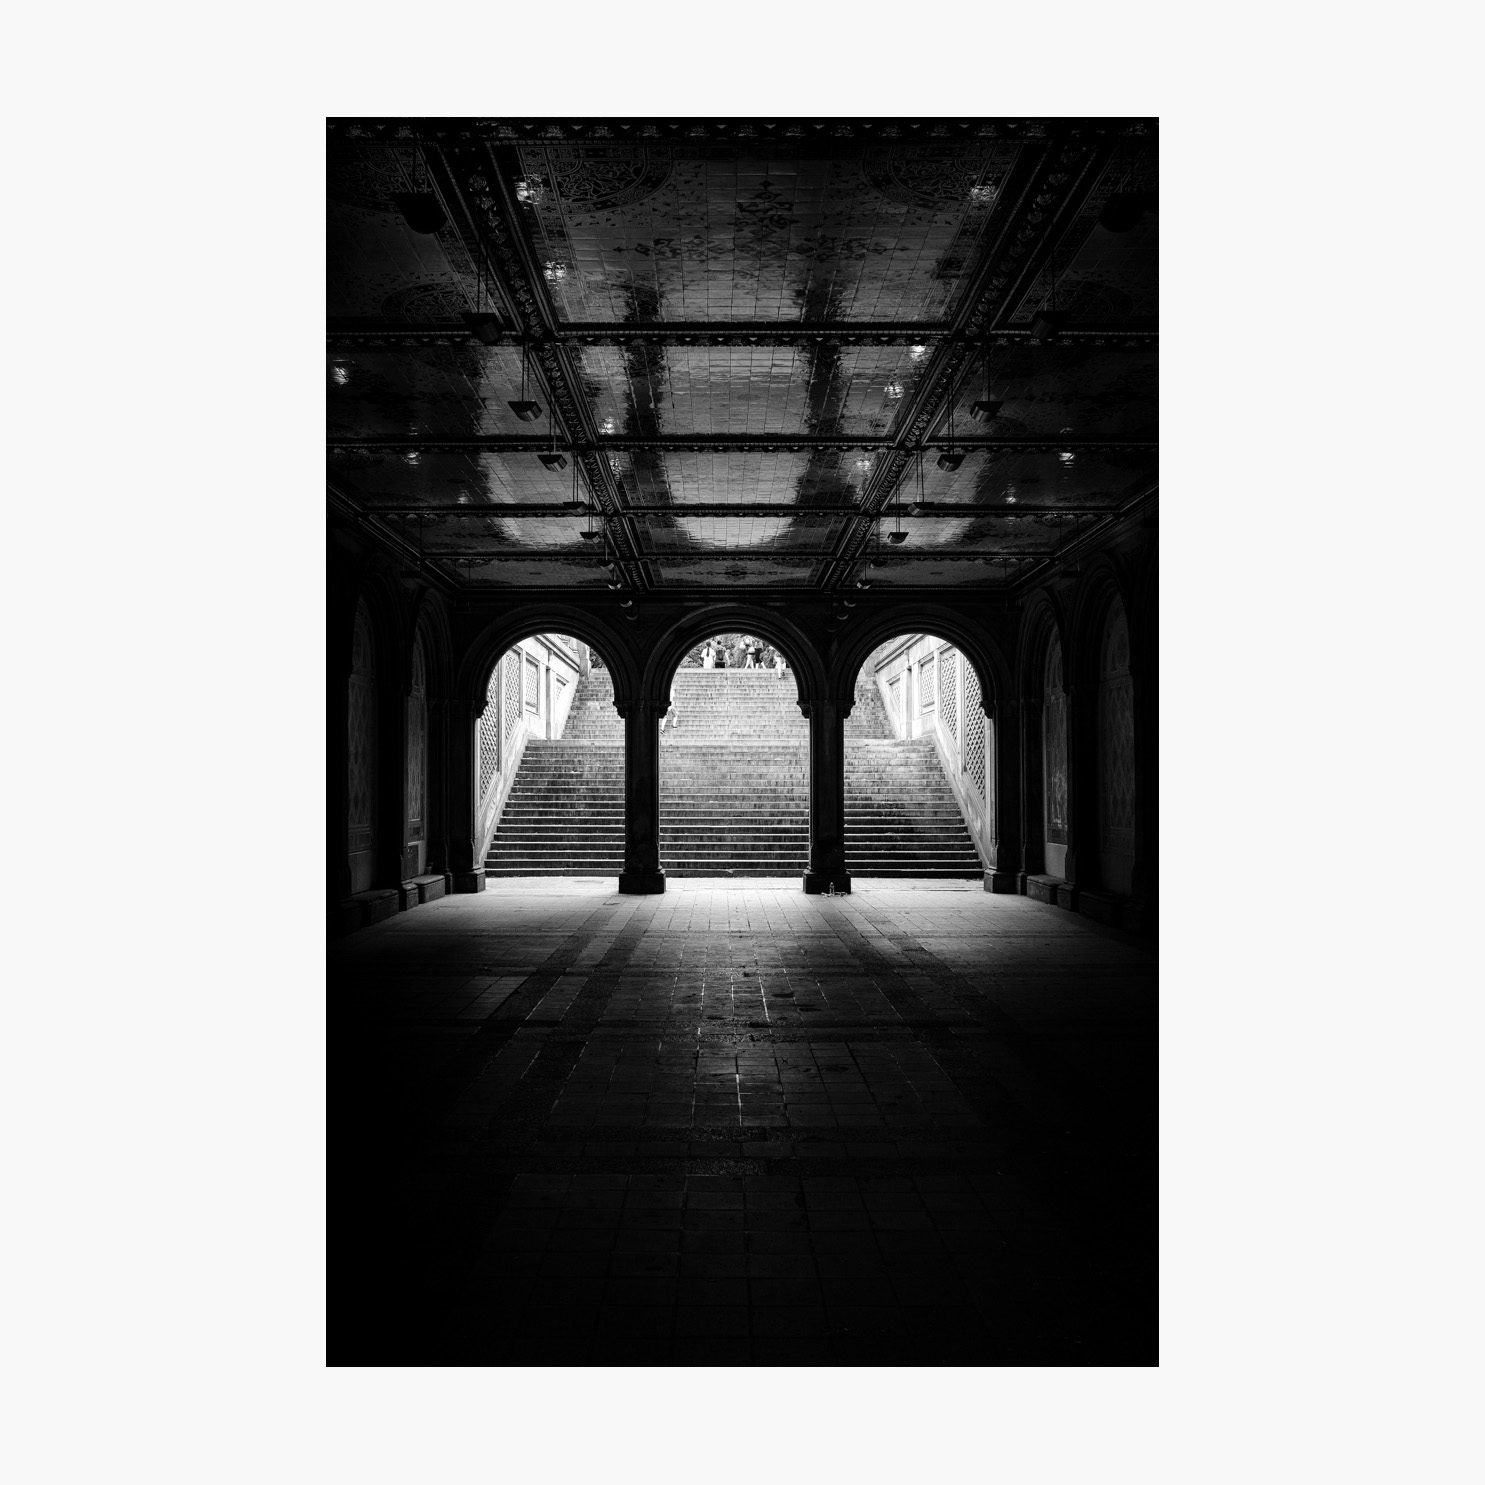 ©-2018-Harry-W-Edmonds-London-Photographer-Photographers-Note-Missing-the-Shot-PN02.jpg